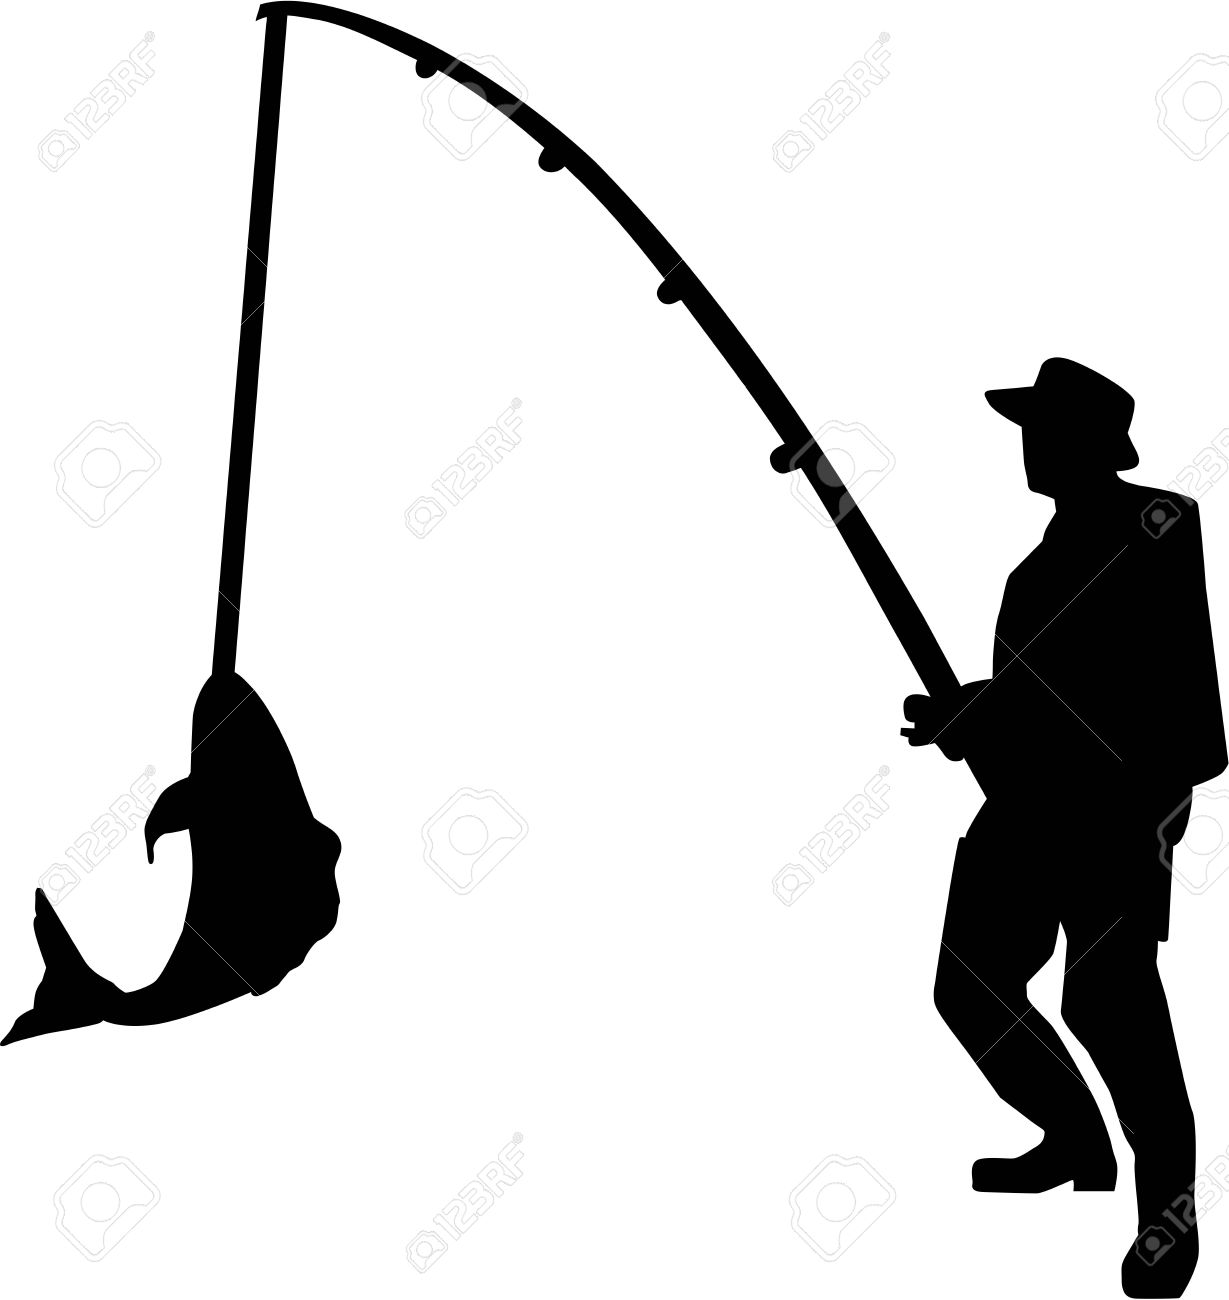 718 Fisherman free clipart.